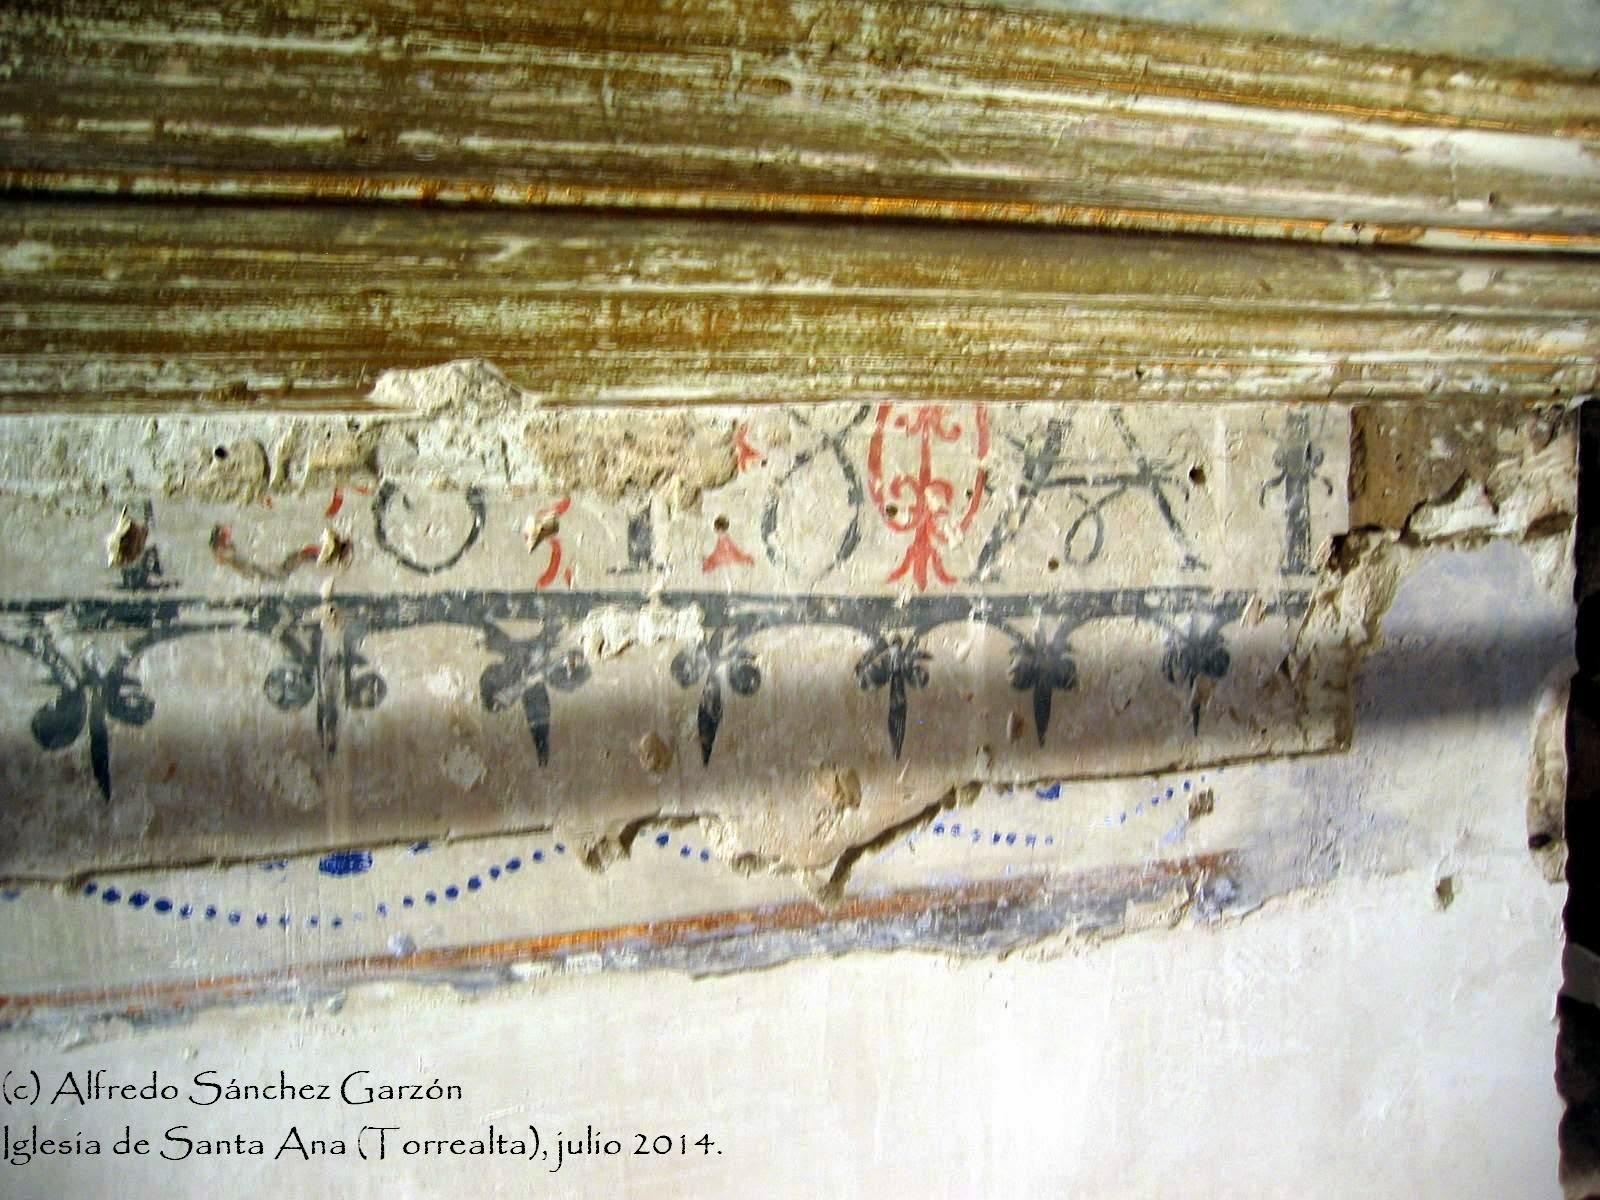 iglesia-santa-ana-torrealta-fragmento-leyenda